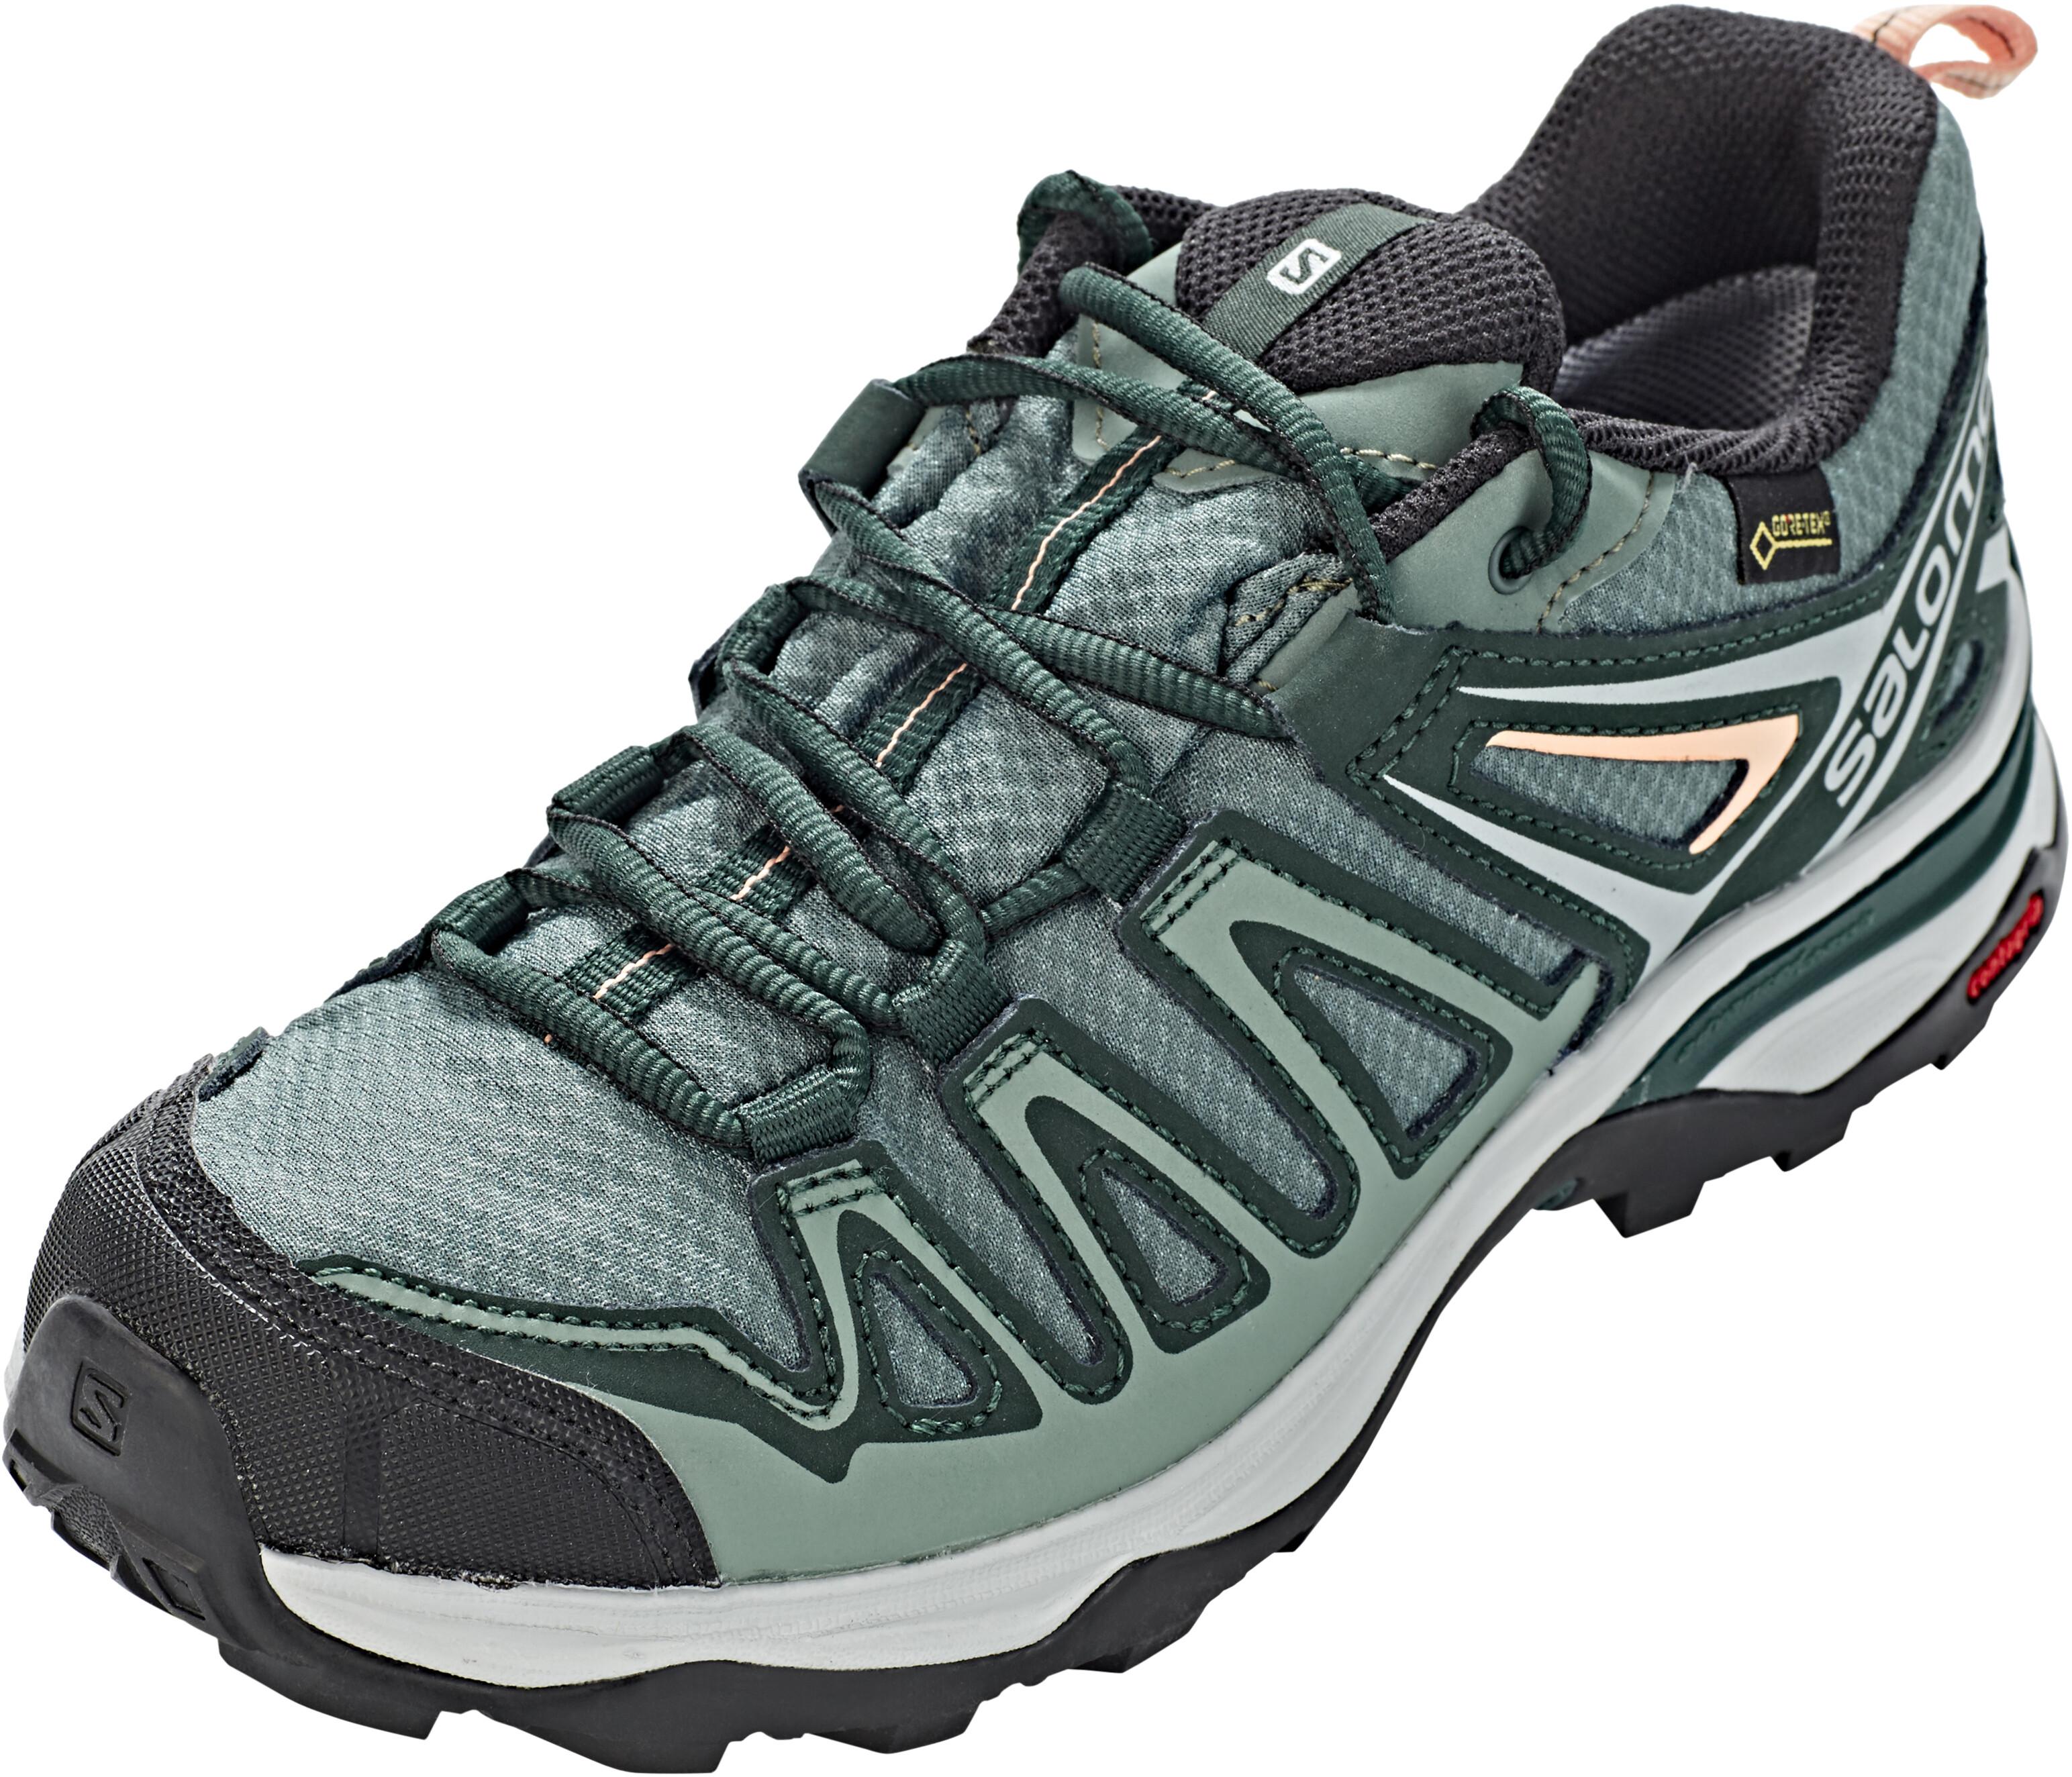 superior quality 06ded e1bf4 Salomon X Ultra 3 Prime GTX Shoes Women green